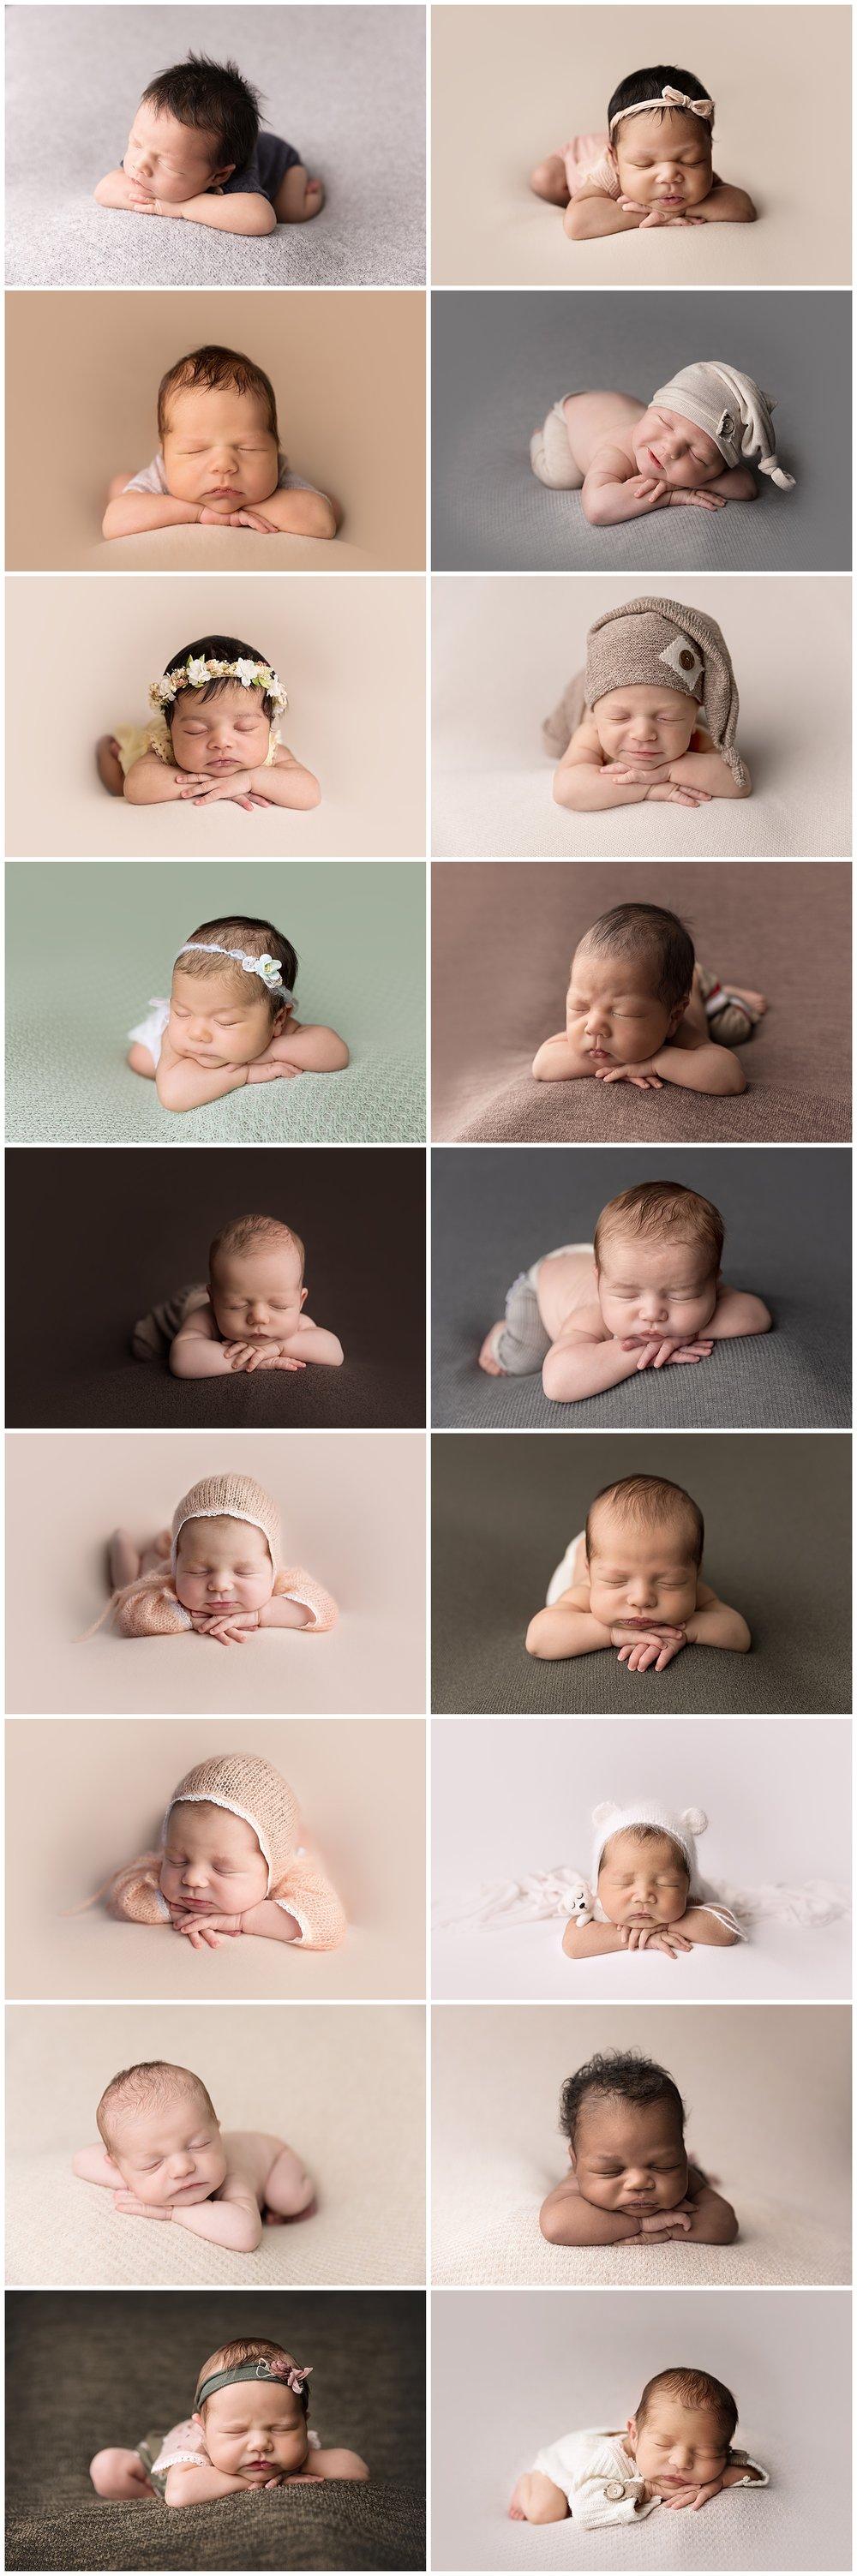 chin on hands newborn beanbag pose